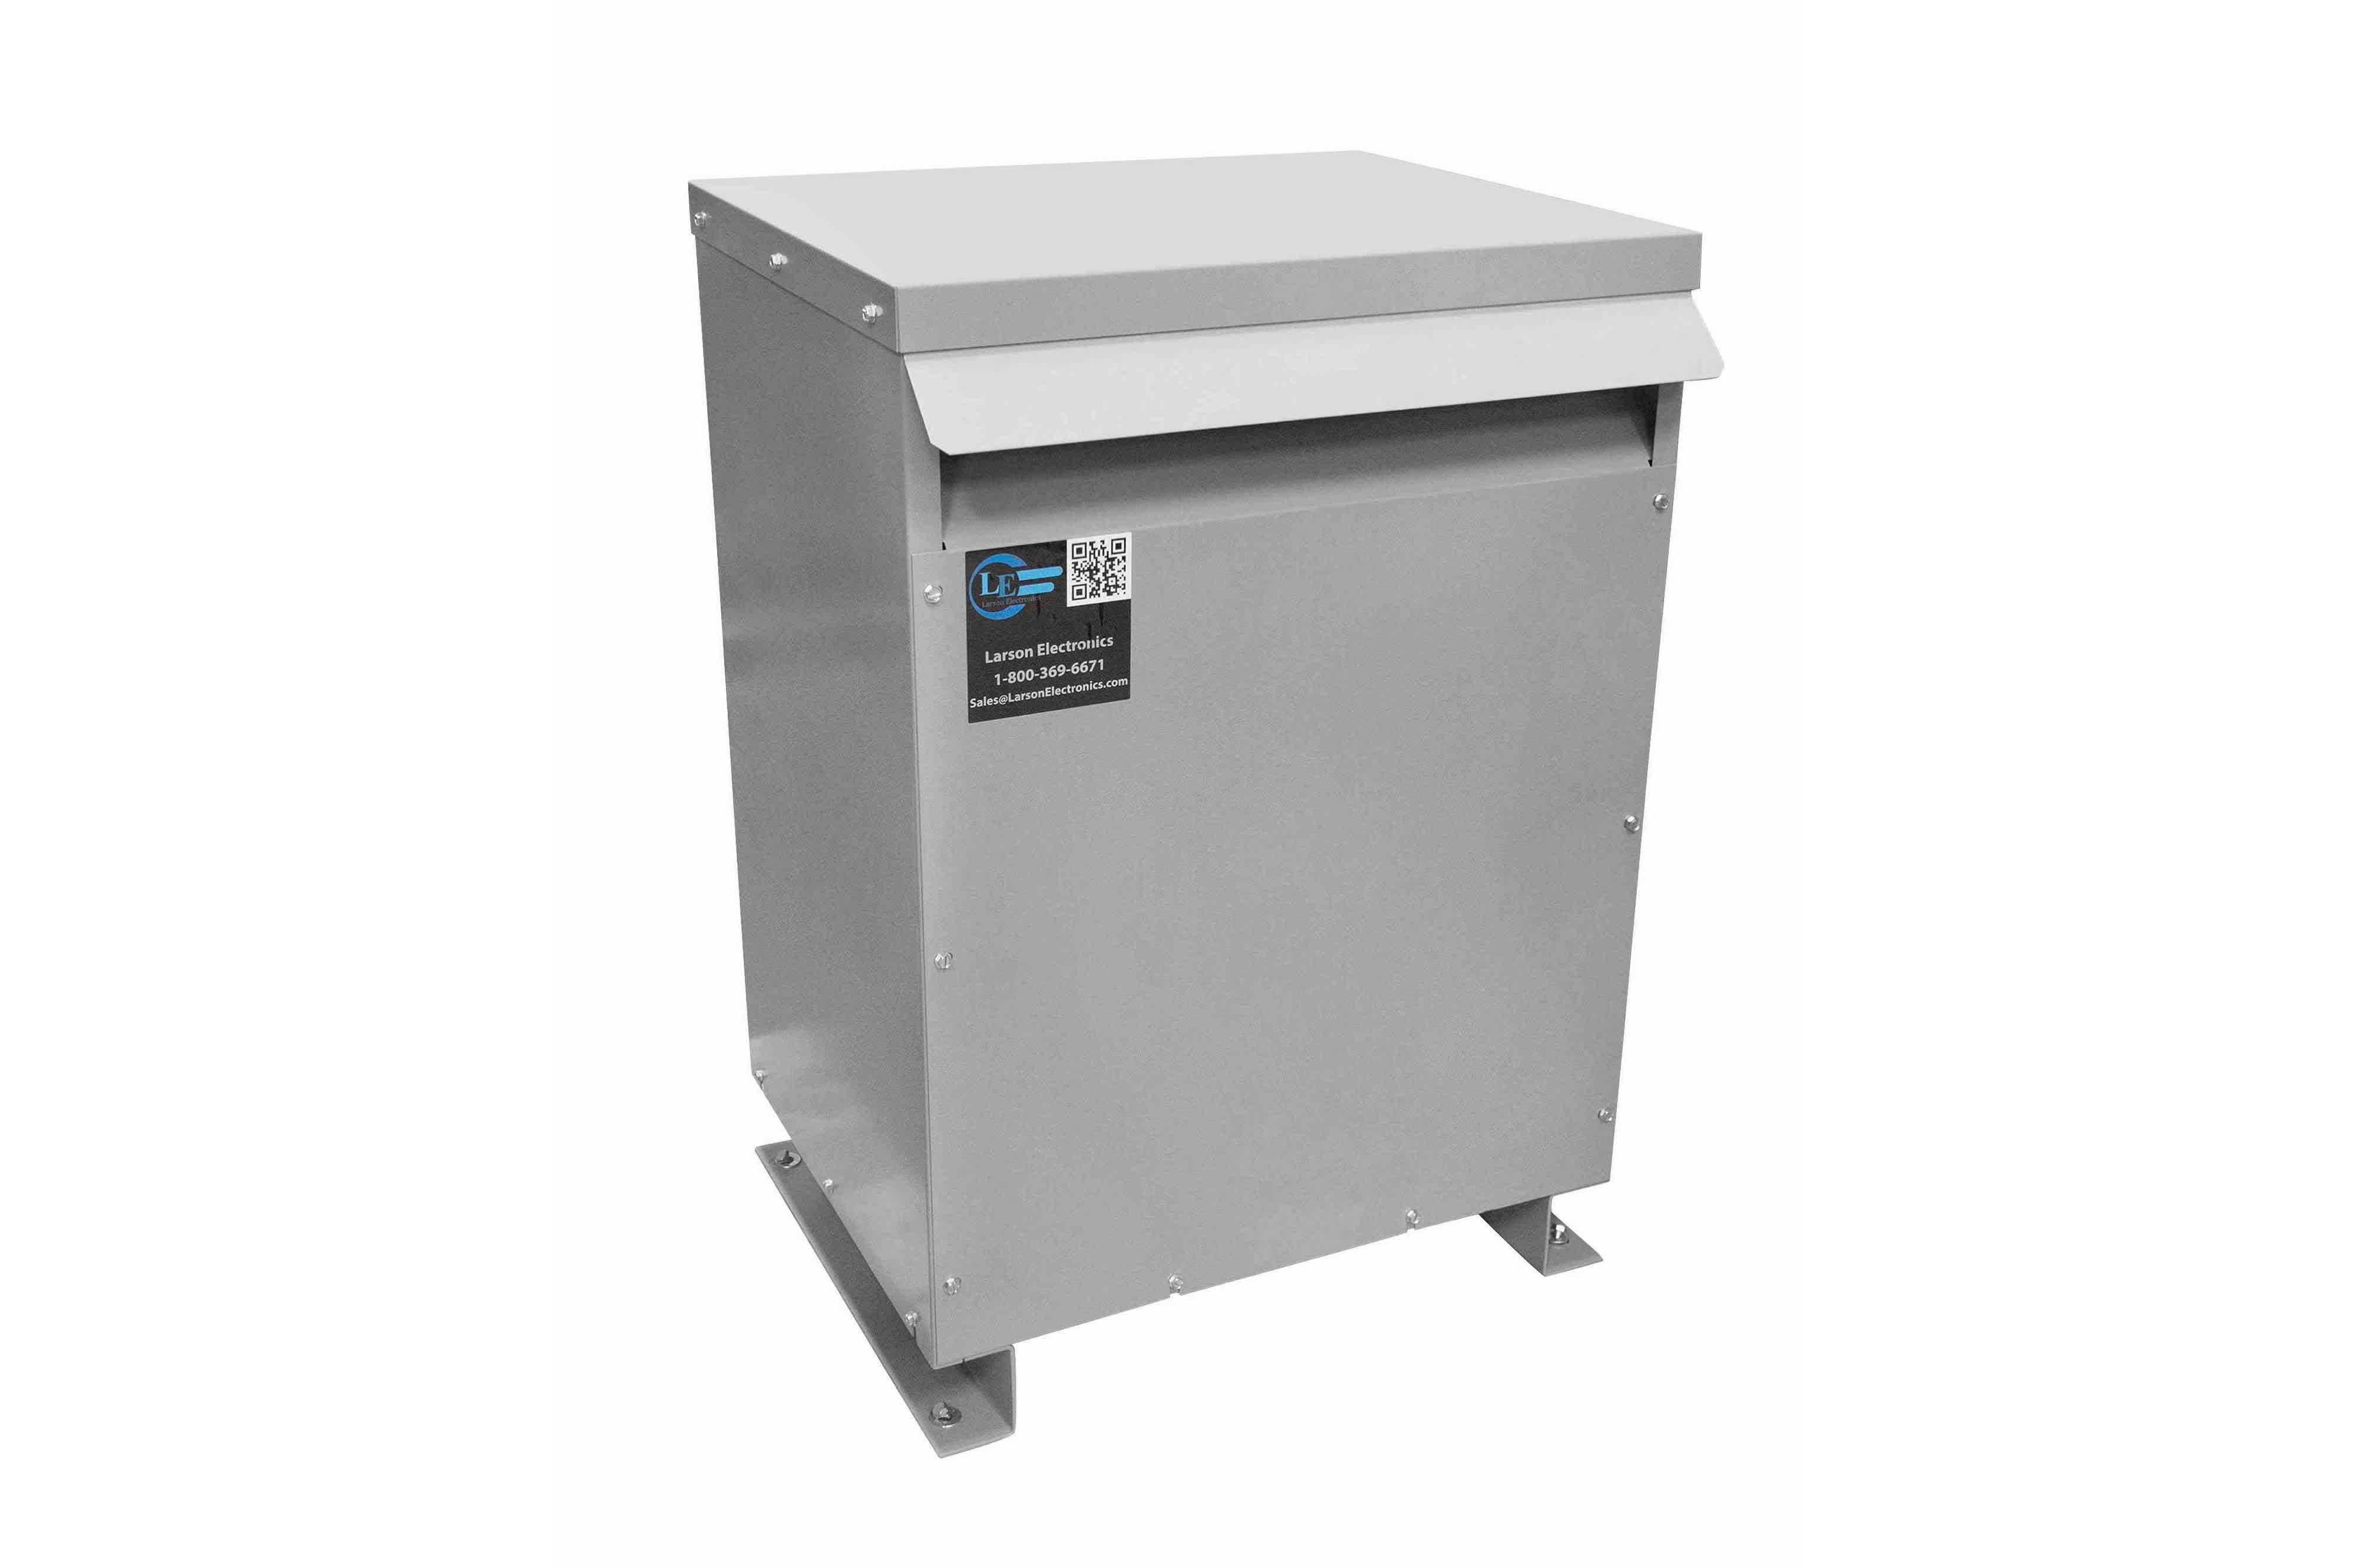 750 kVA 3PH DOE Transformer, 480V Delta Primary, 208Y/120 Wye-N Secondary, N3R, Ventilated, 60 Hz